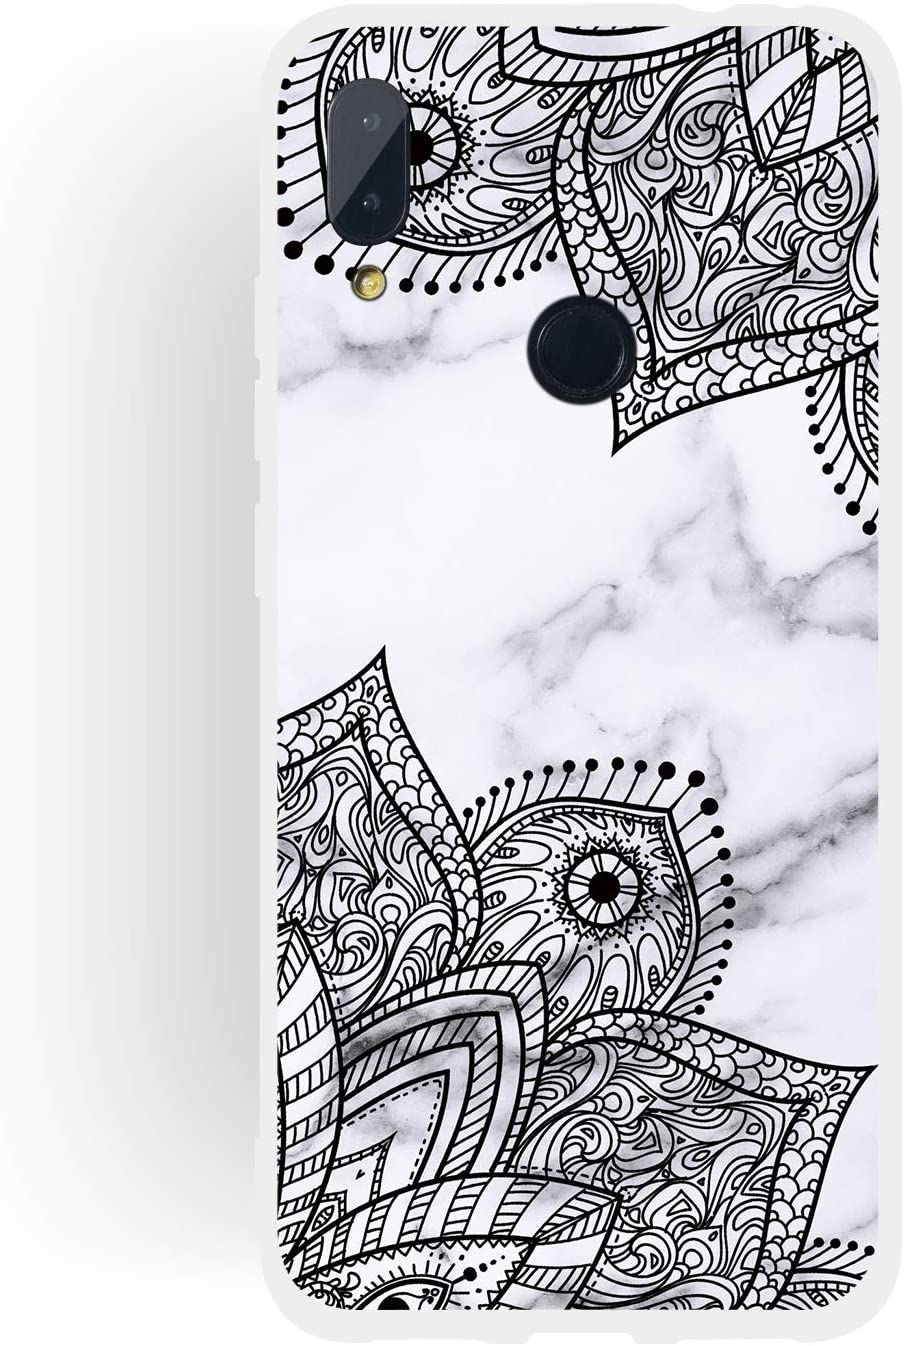 Dyluck Coque Xiaomi Redmi Note 7 Marbre Housse Souple TPU Ultra Fine /Étui Doux Gel Bumper Anti Choc Case Cover pour Xiaomi Redmi Note 7 Coque Redmi Note 7 Silicone Couleur